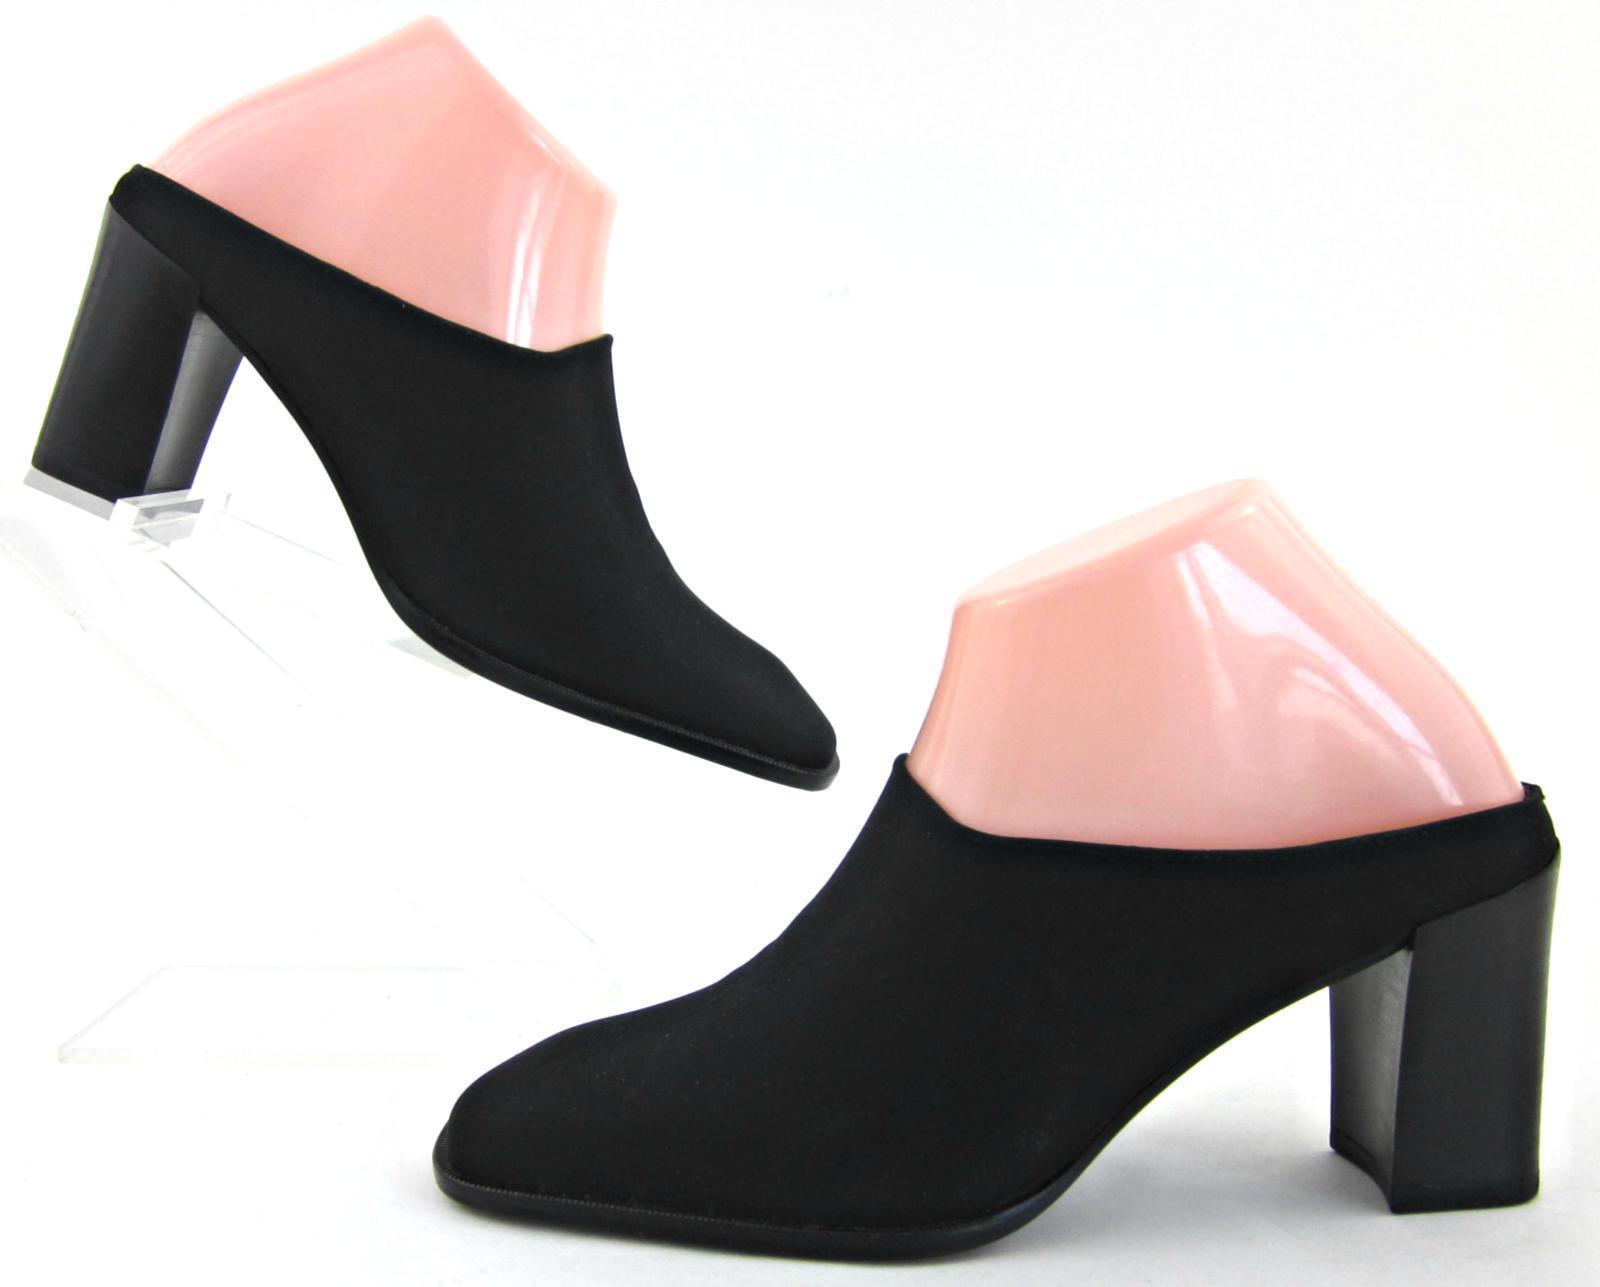 NEW  Donald J Pliner Mule Slide Heels Black Stretch Fabric Sz 6.5M